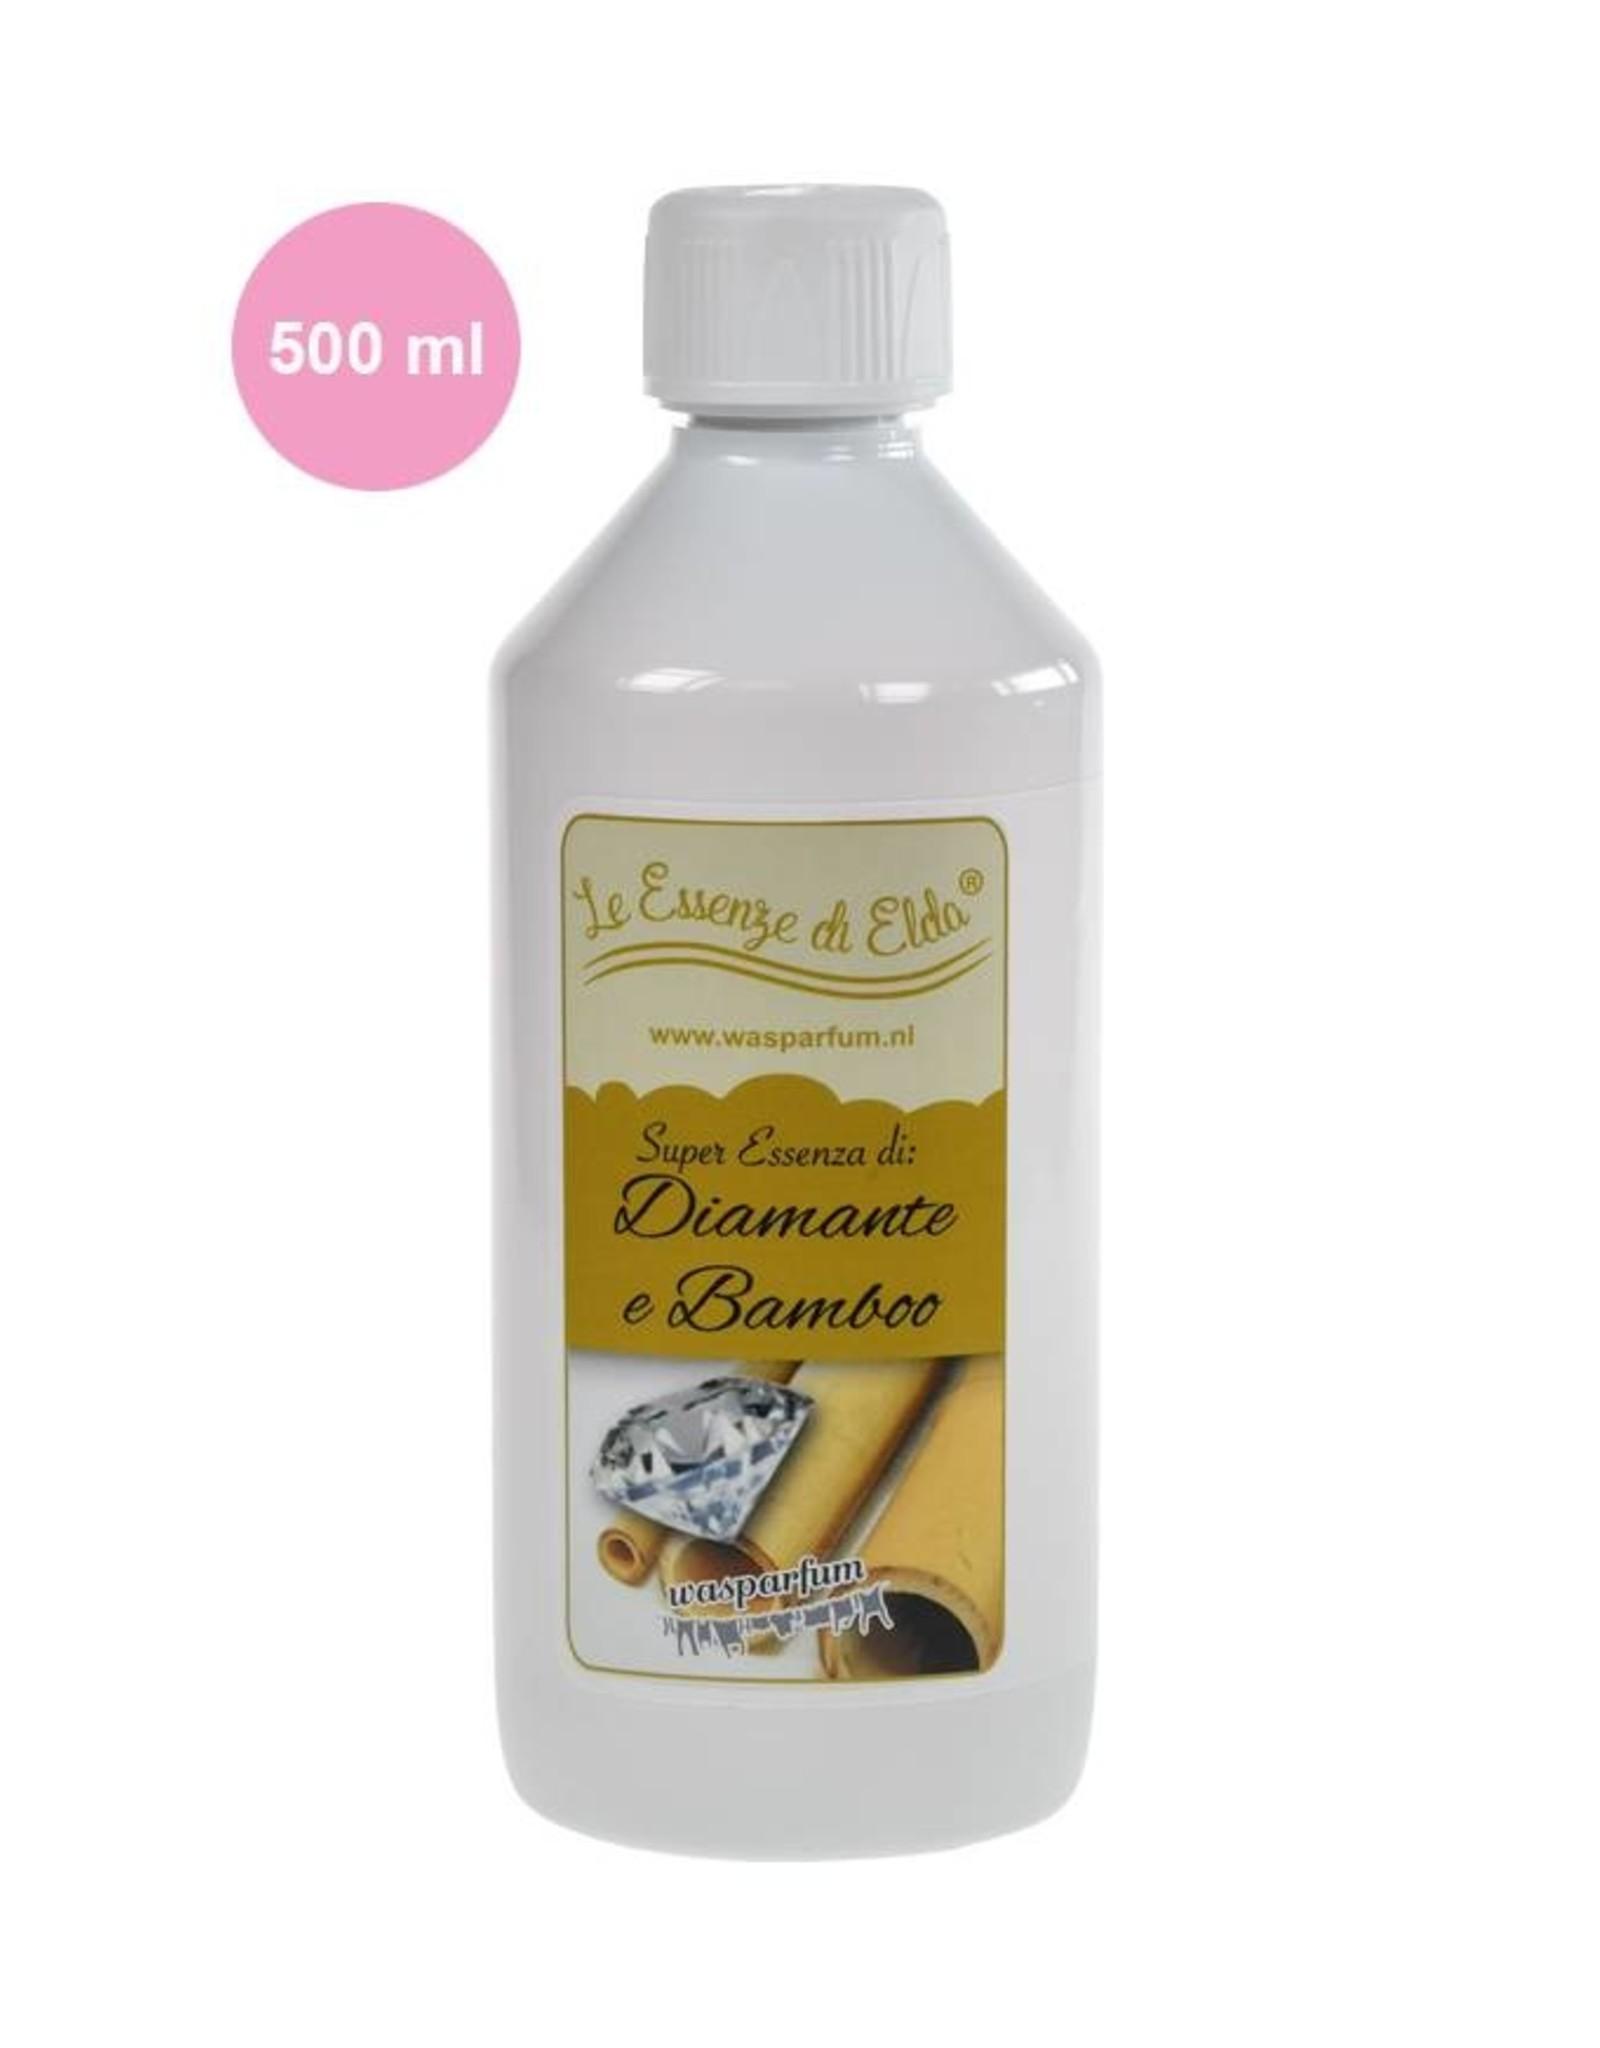 Wasparfum Fles Diamante & Bamboo Wasparfum